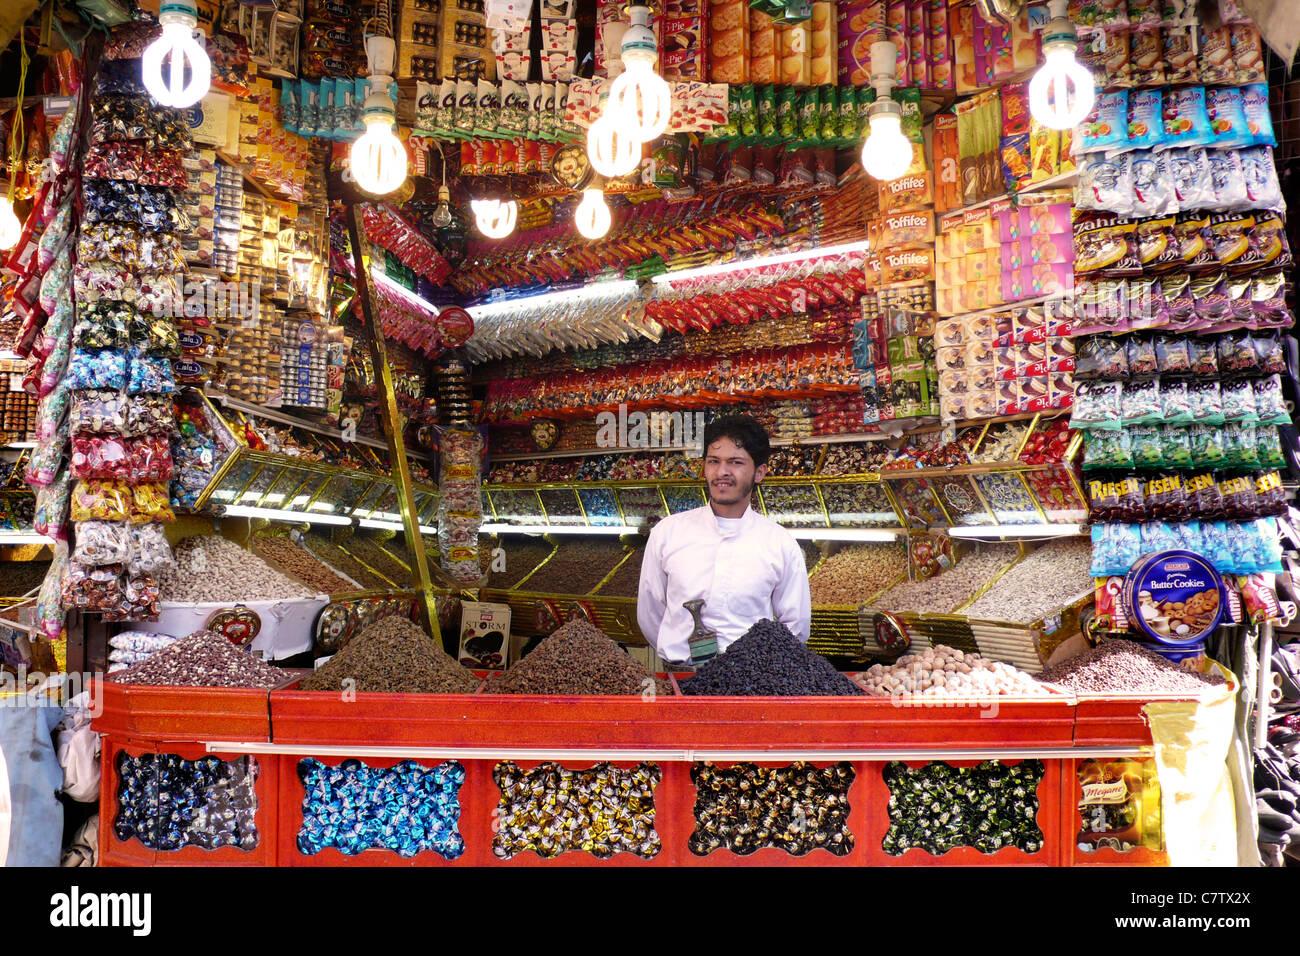 Yemen, Sanaa, greengrocer in souk - Stock Image